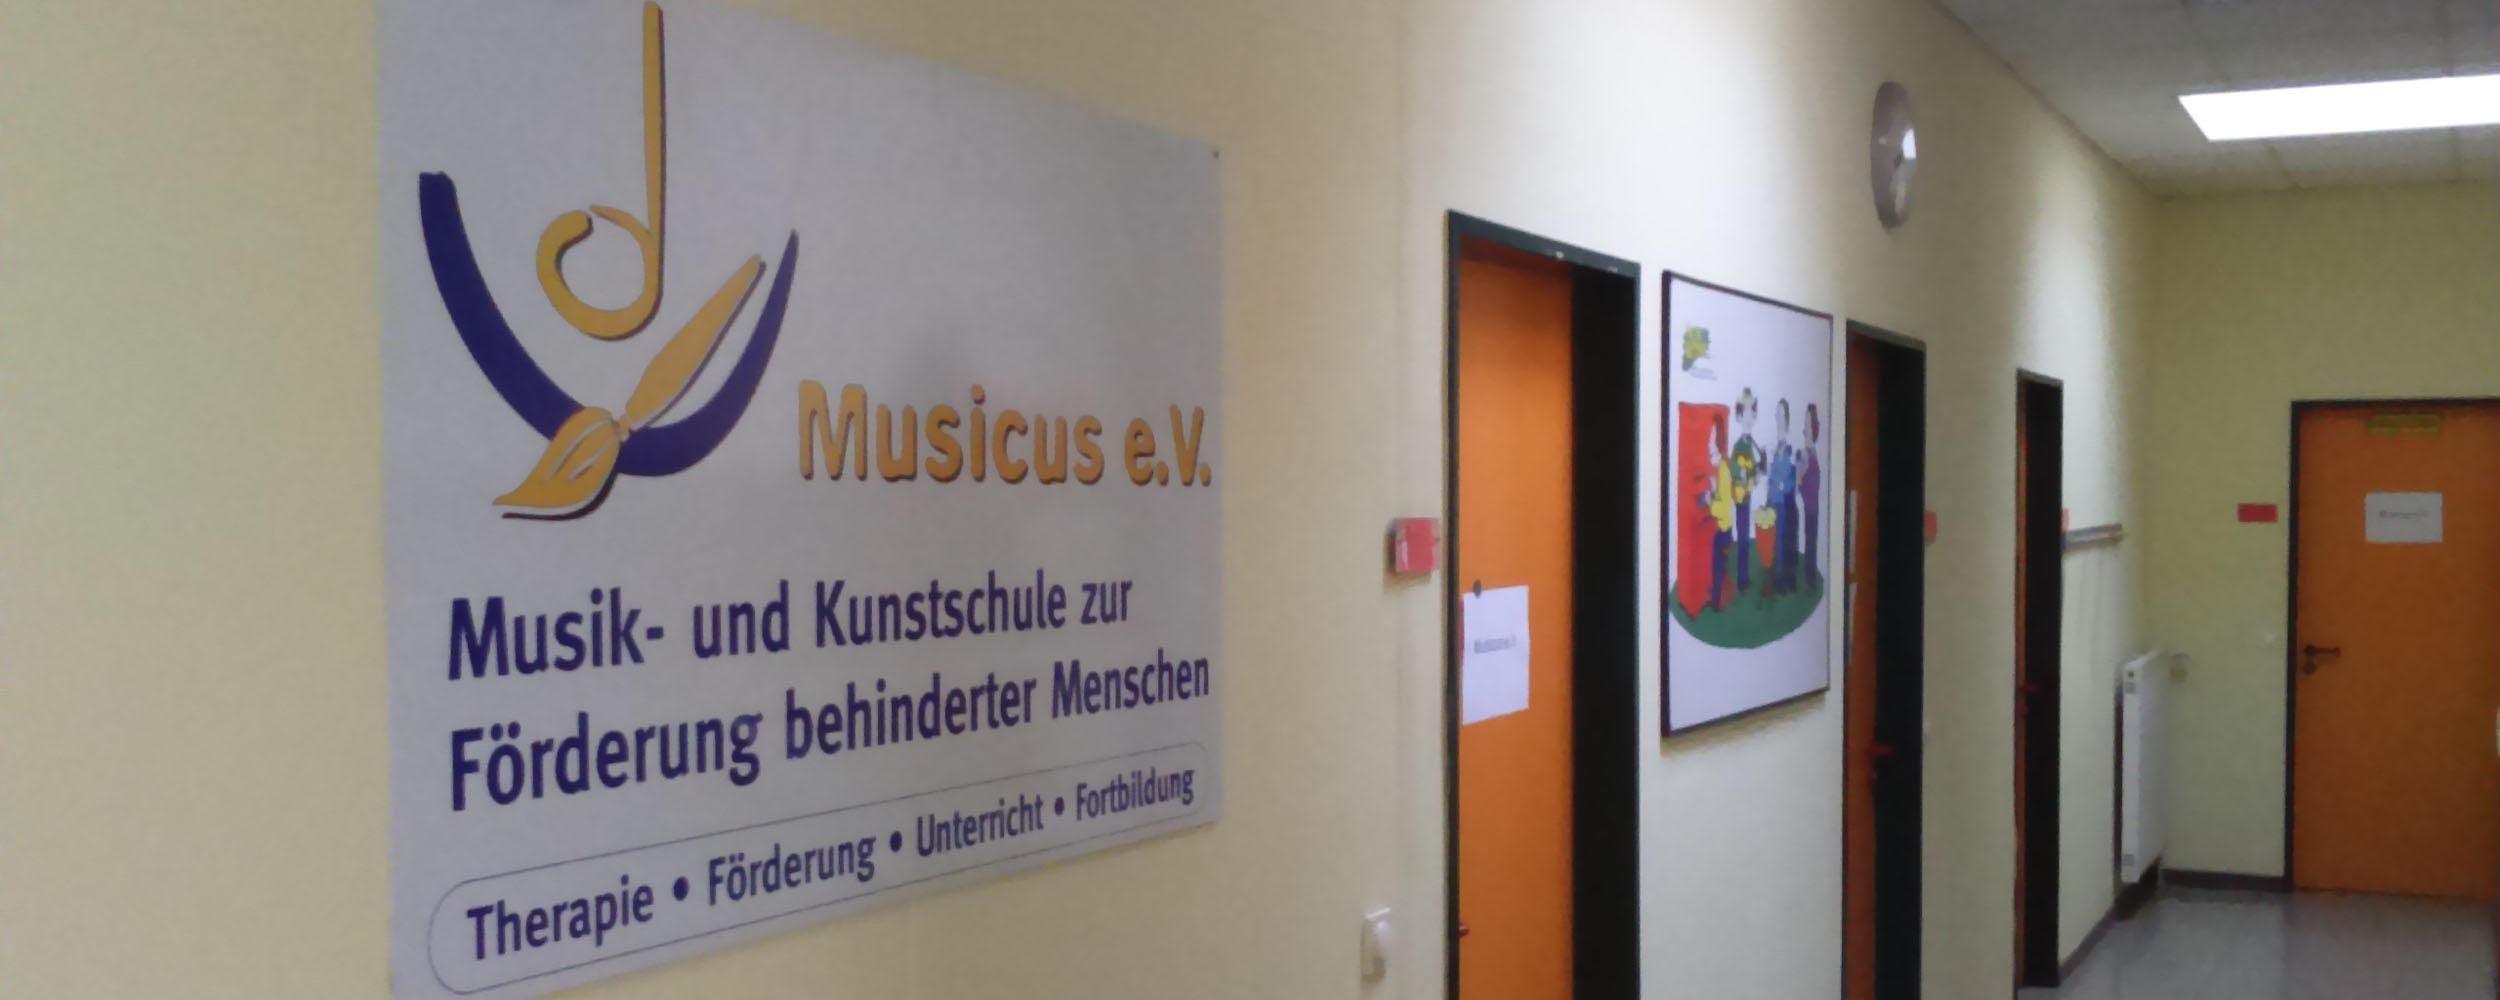 Musicus e.V. - Fortbildungen